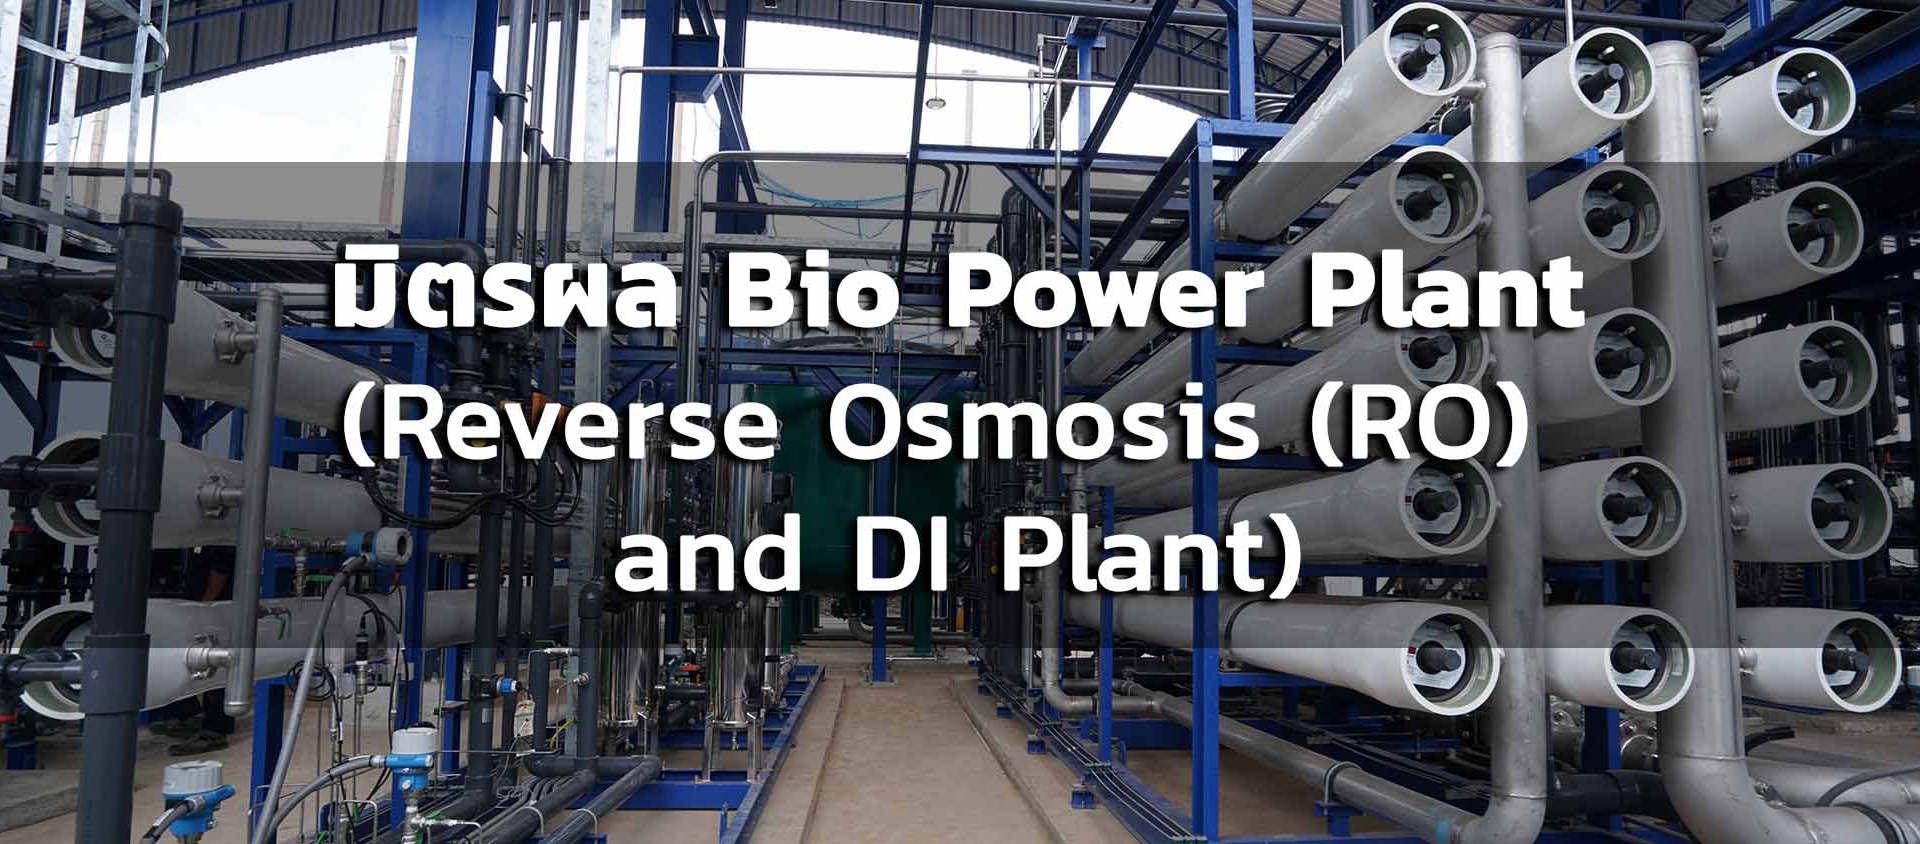 Mitr Phol Bio Power Plant